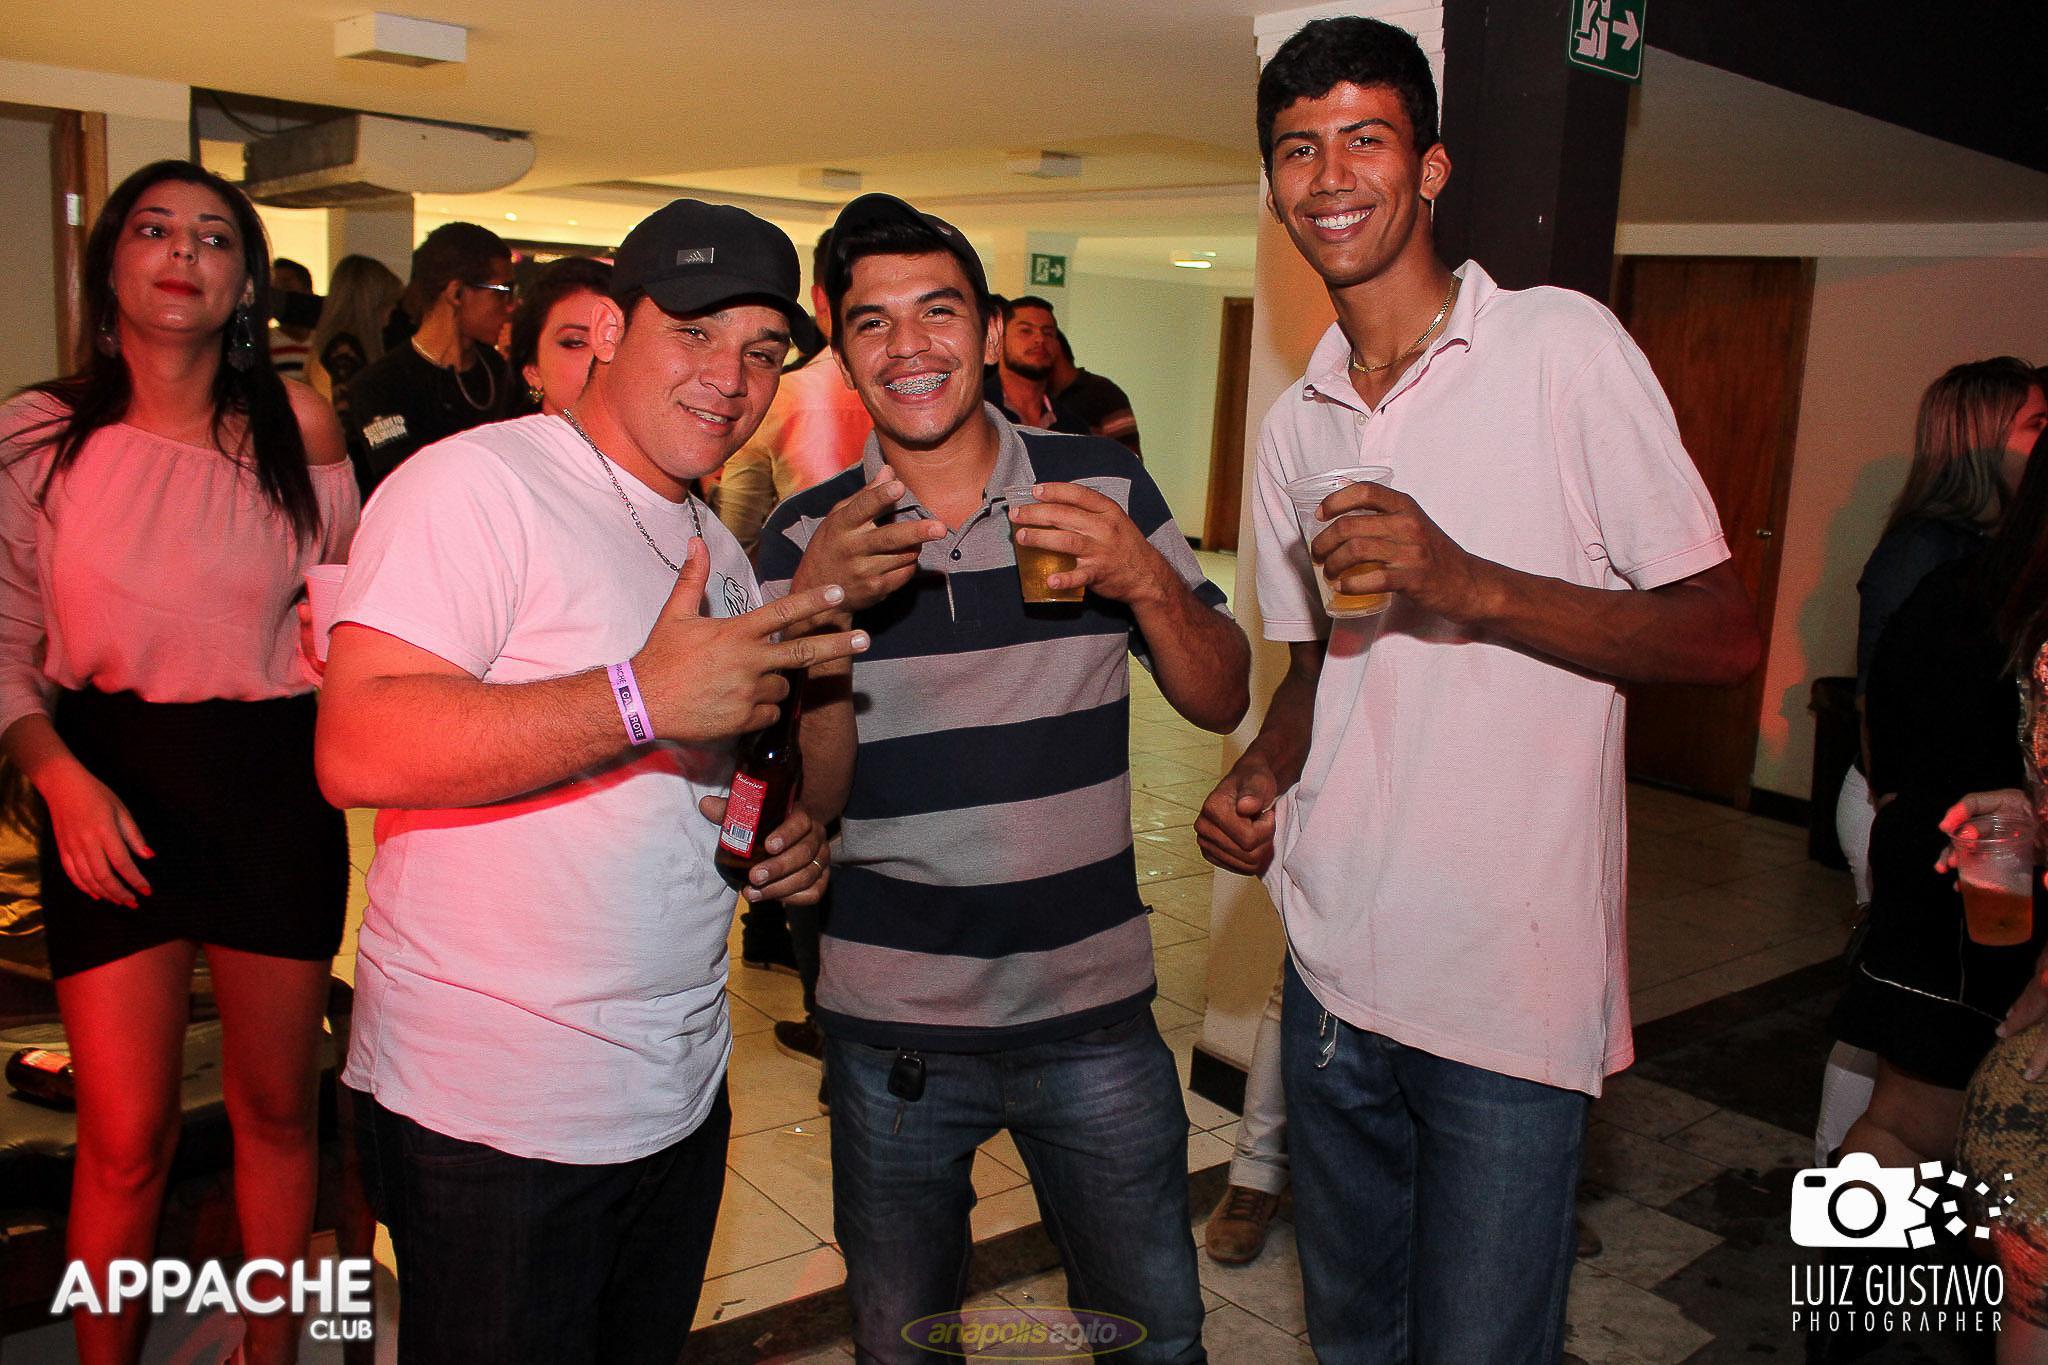 Luiz Gustavo Photographer-147